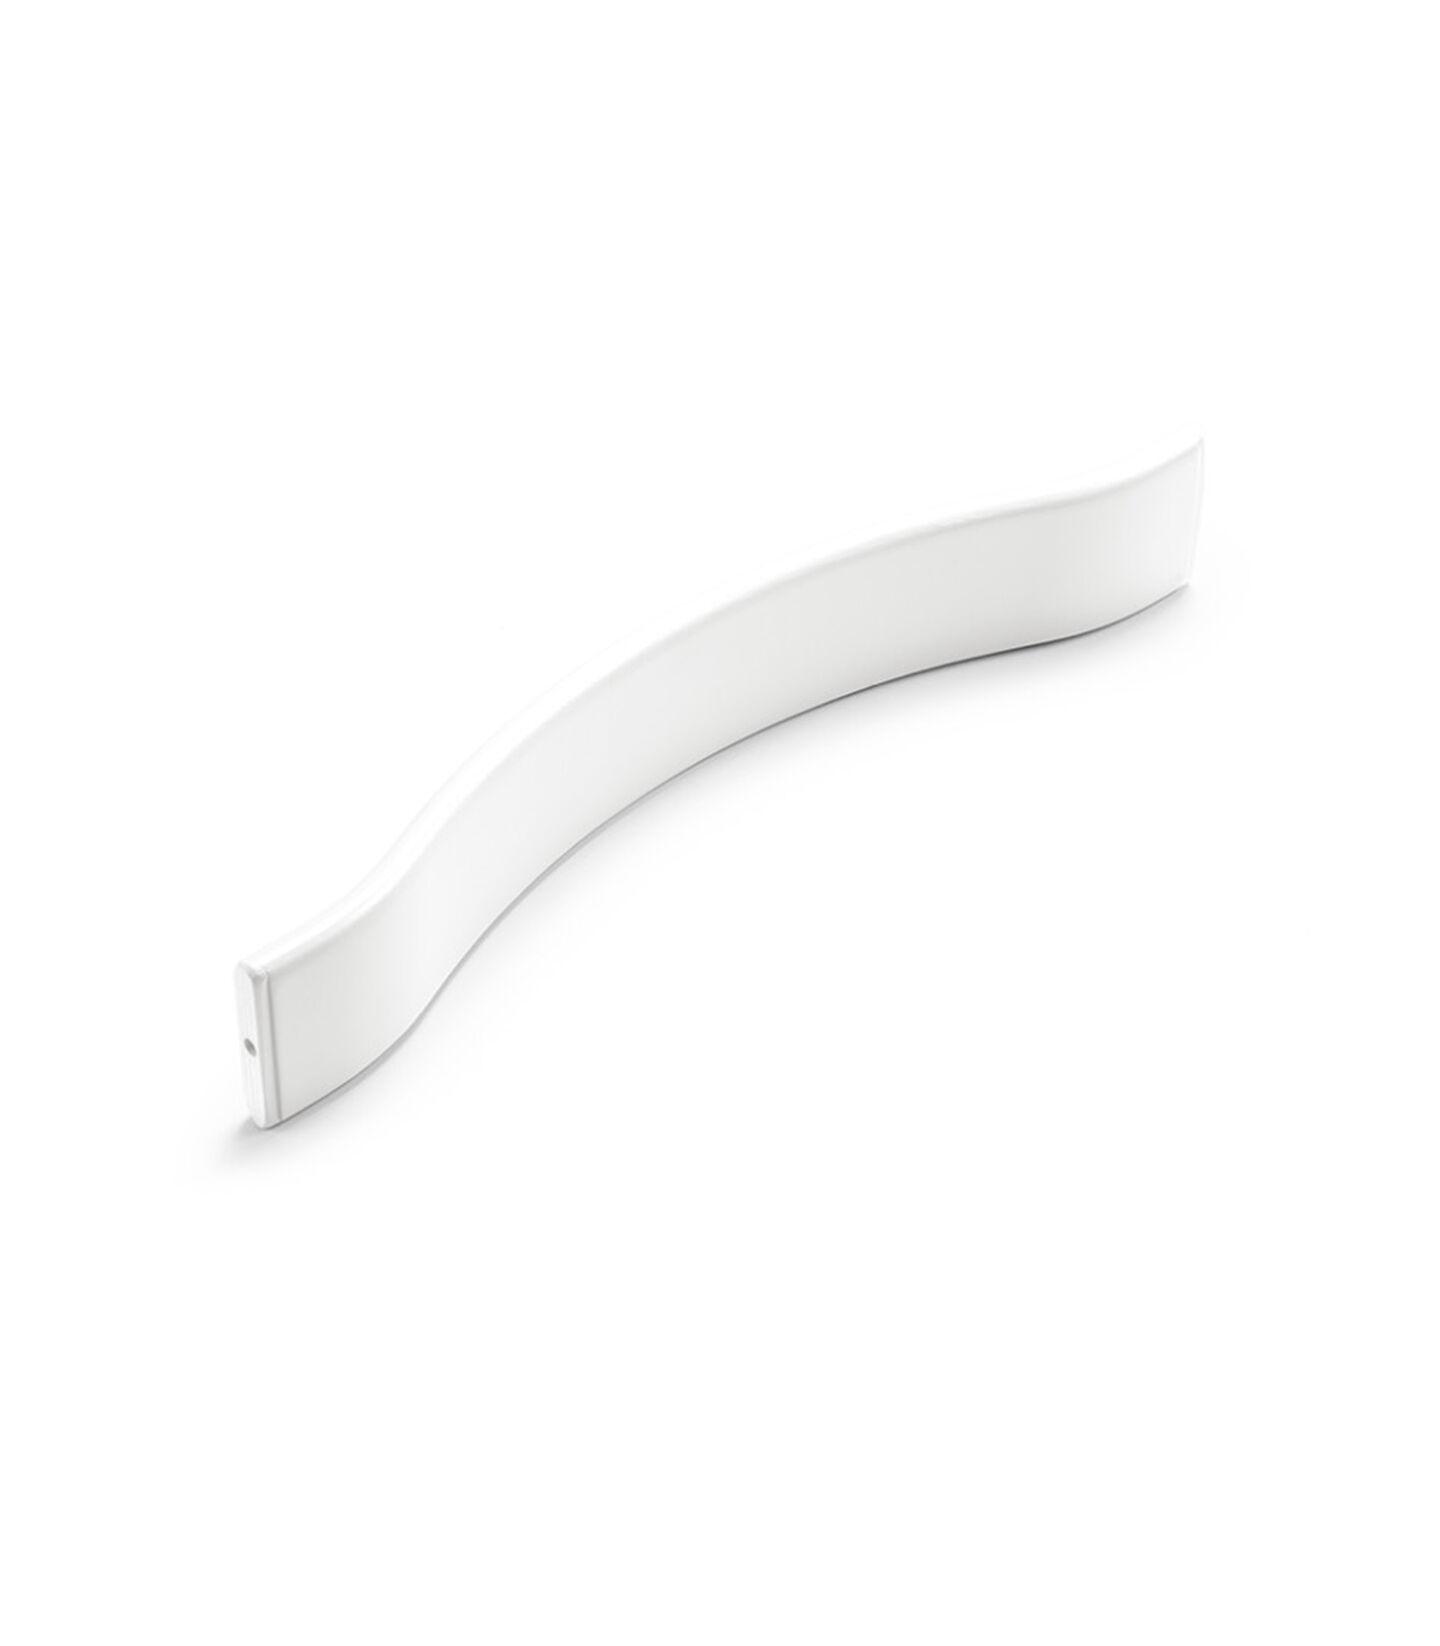 Tripp Trapp® Backlaminate White, White, mainview view 1